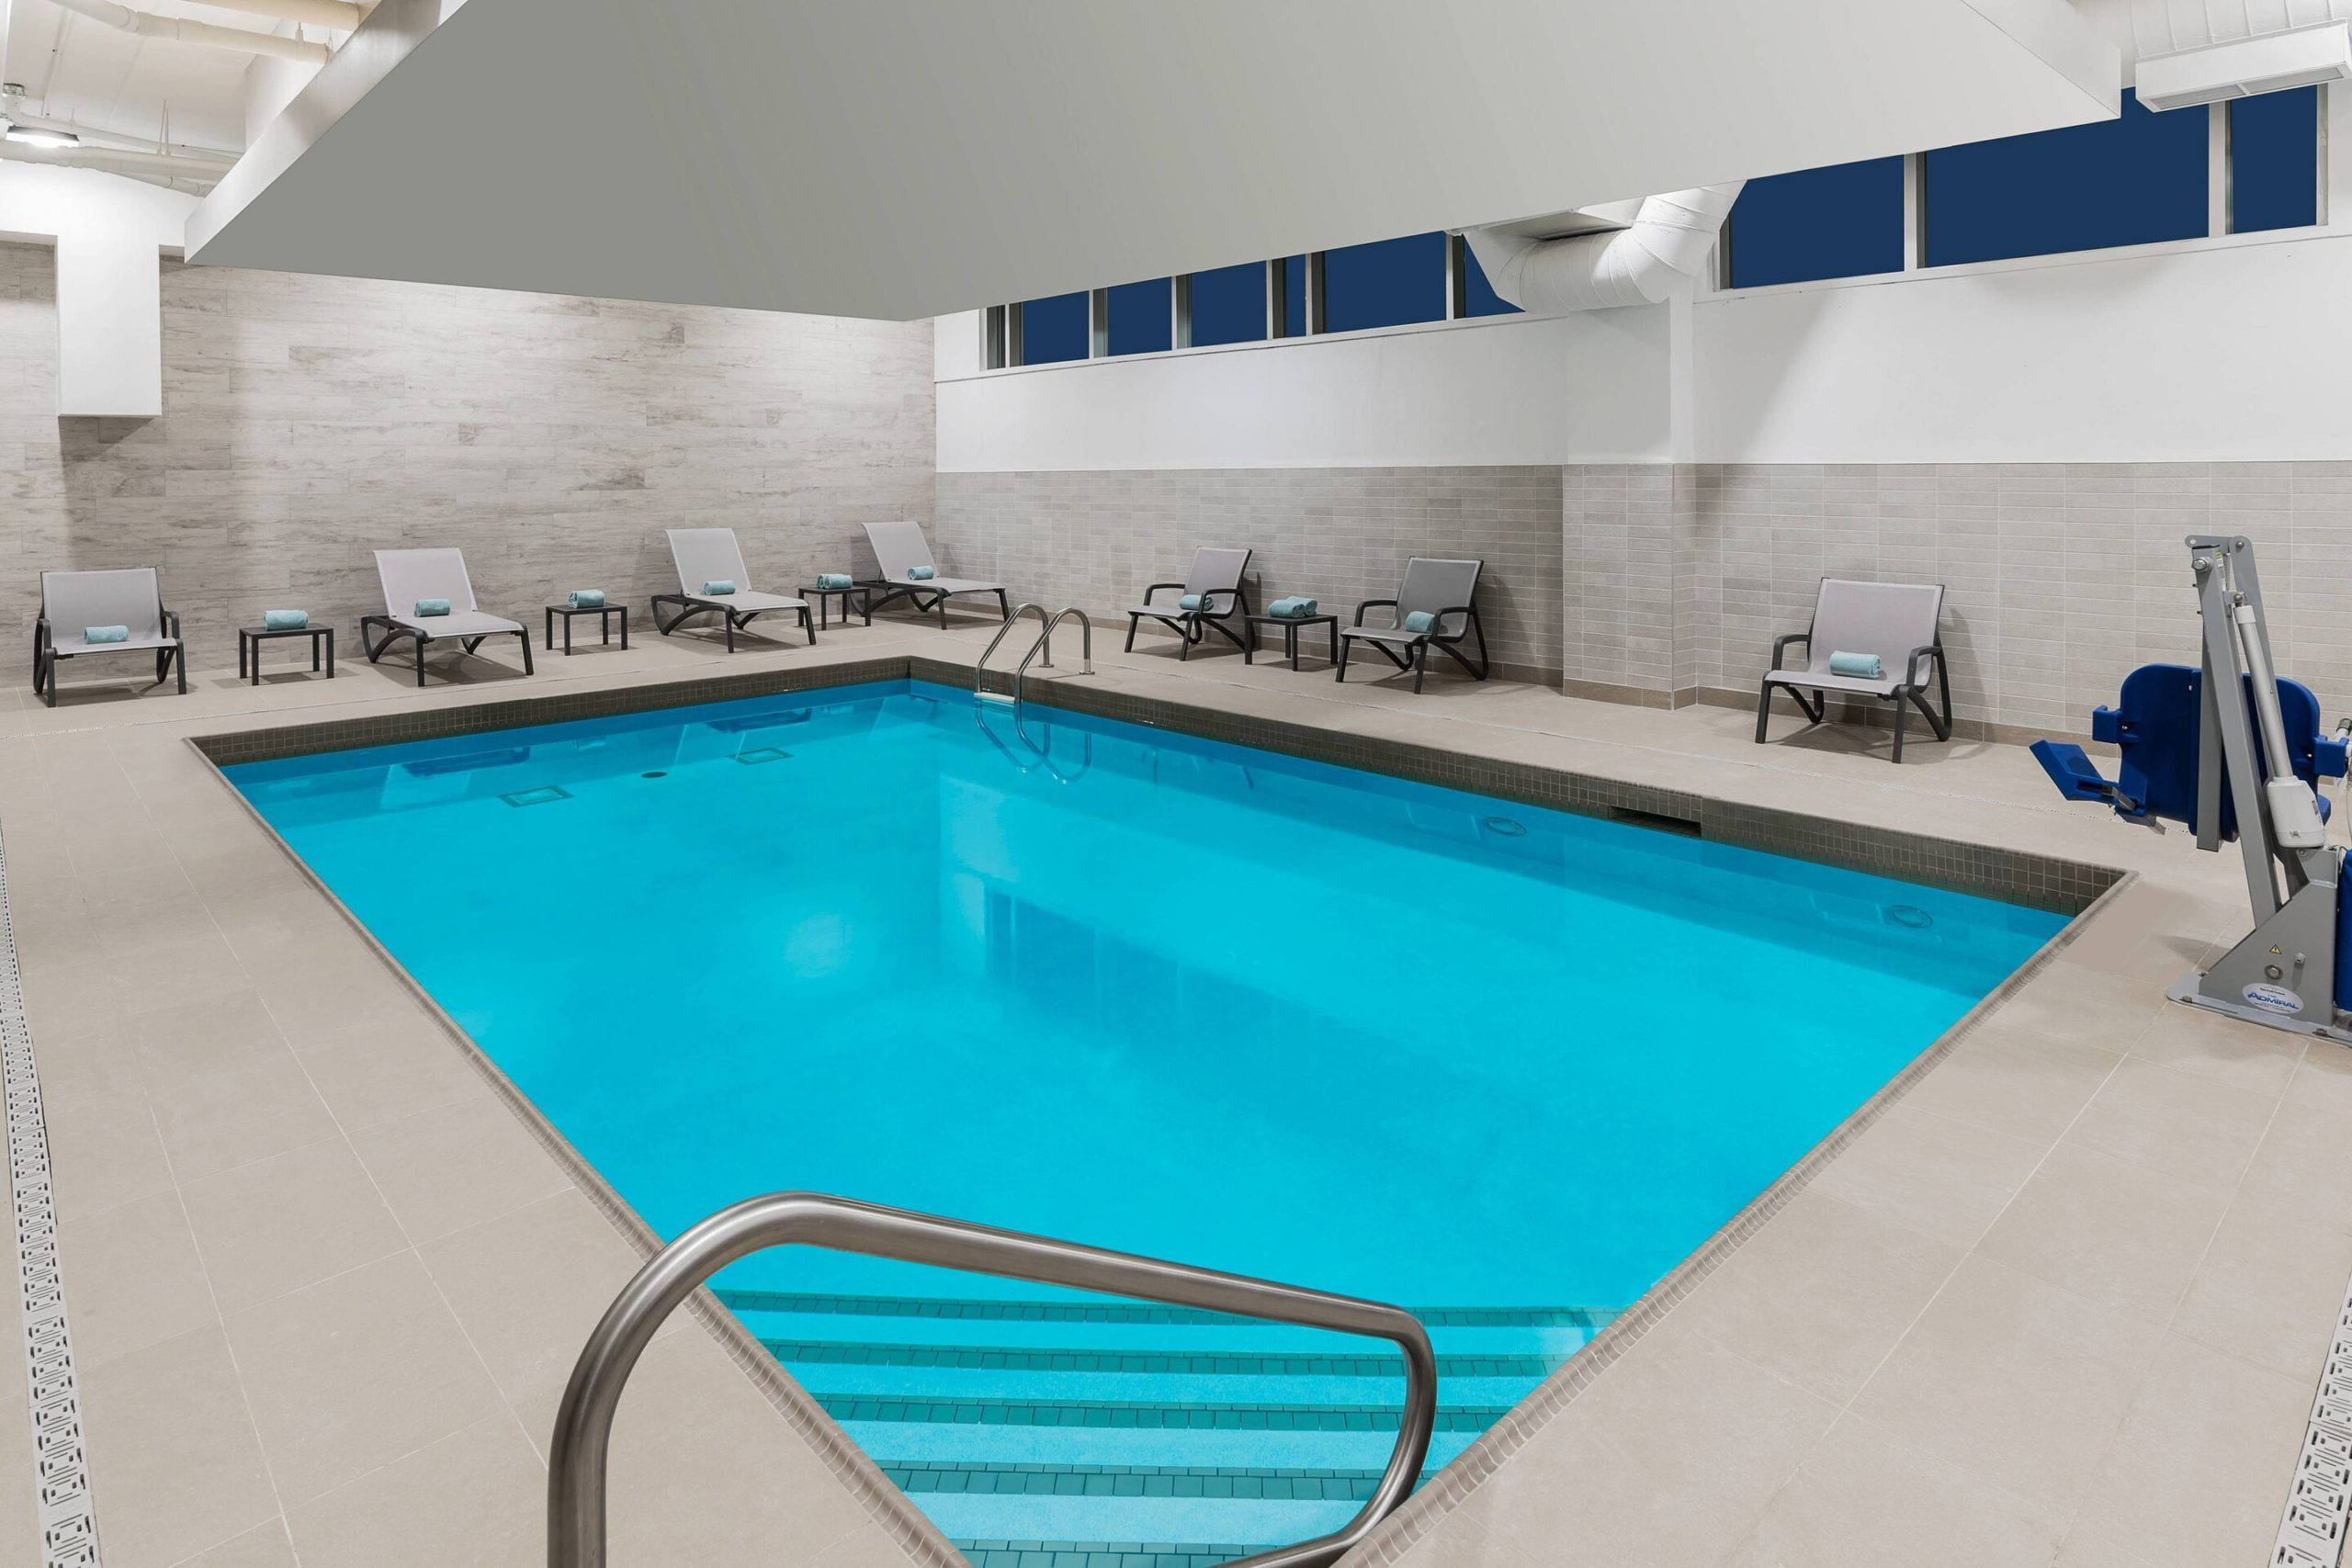 Marriott Courtyard Burlington swimming pool